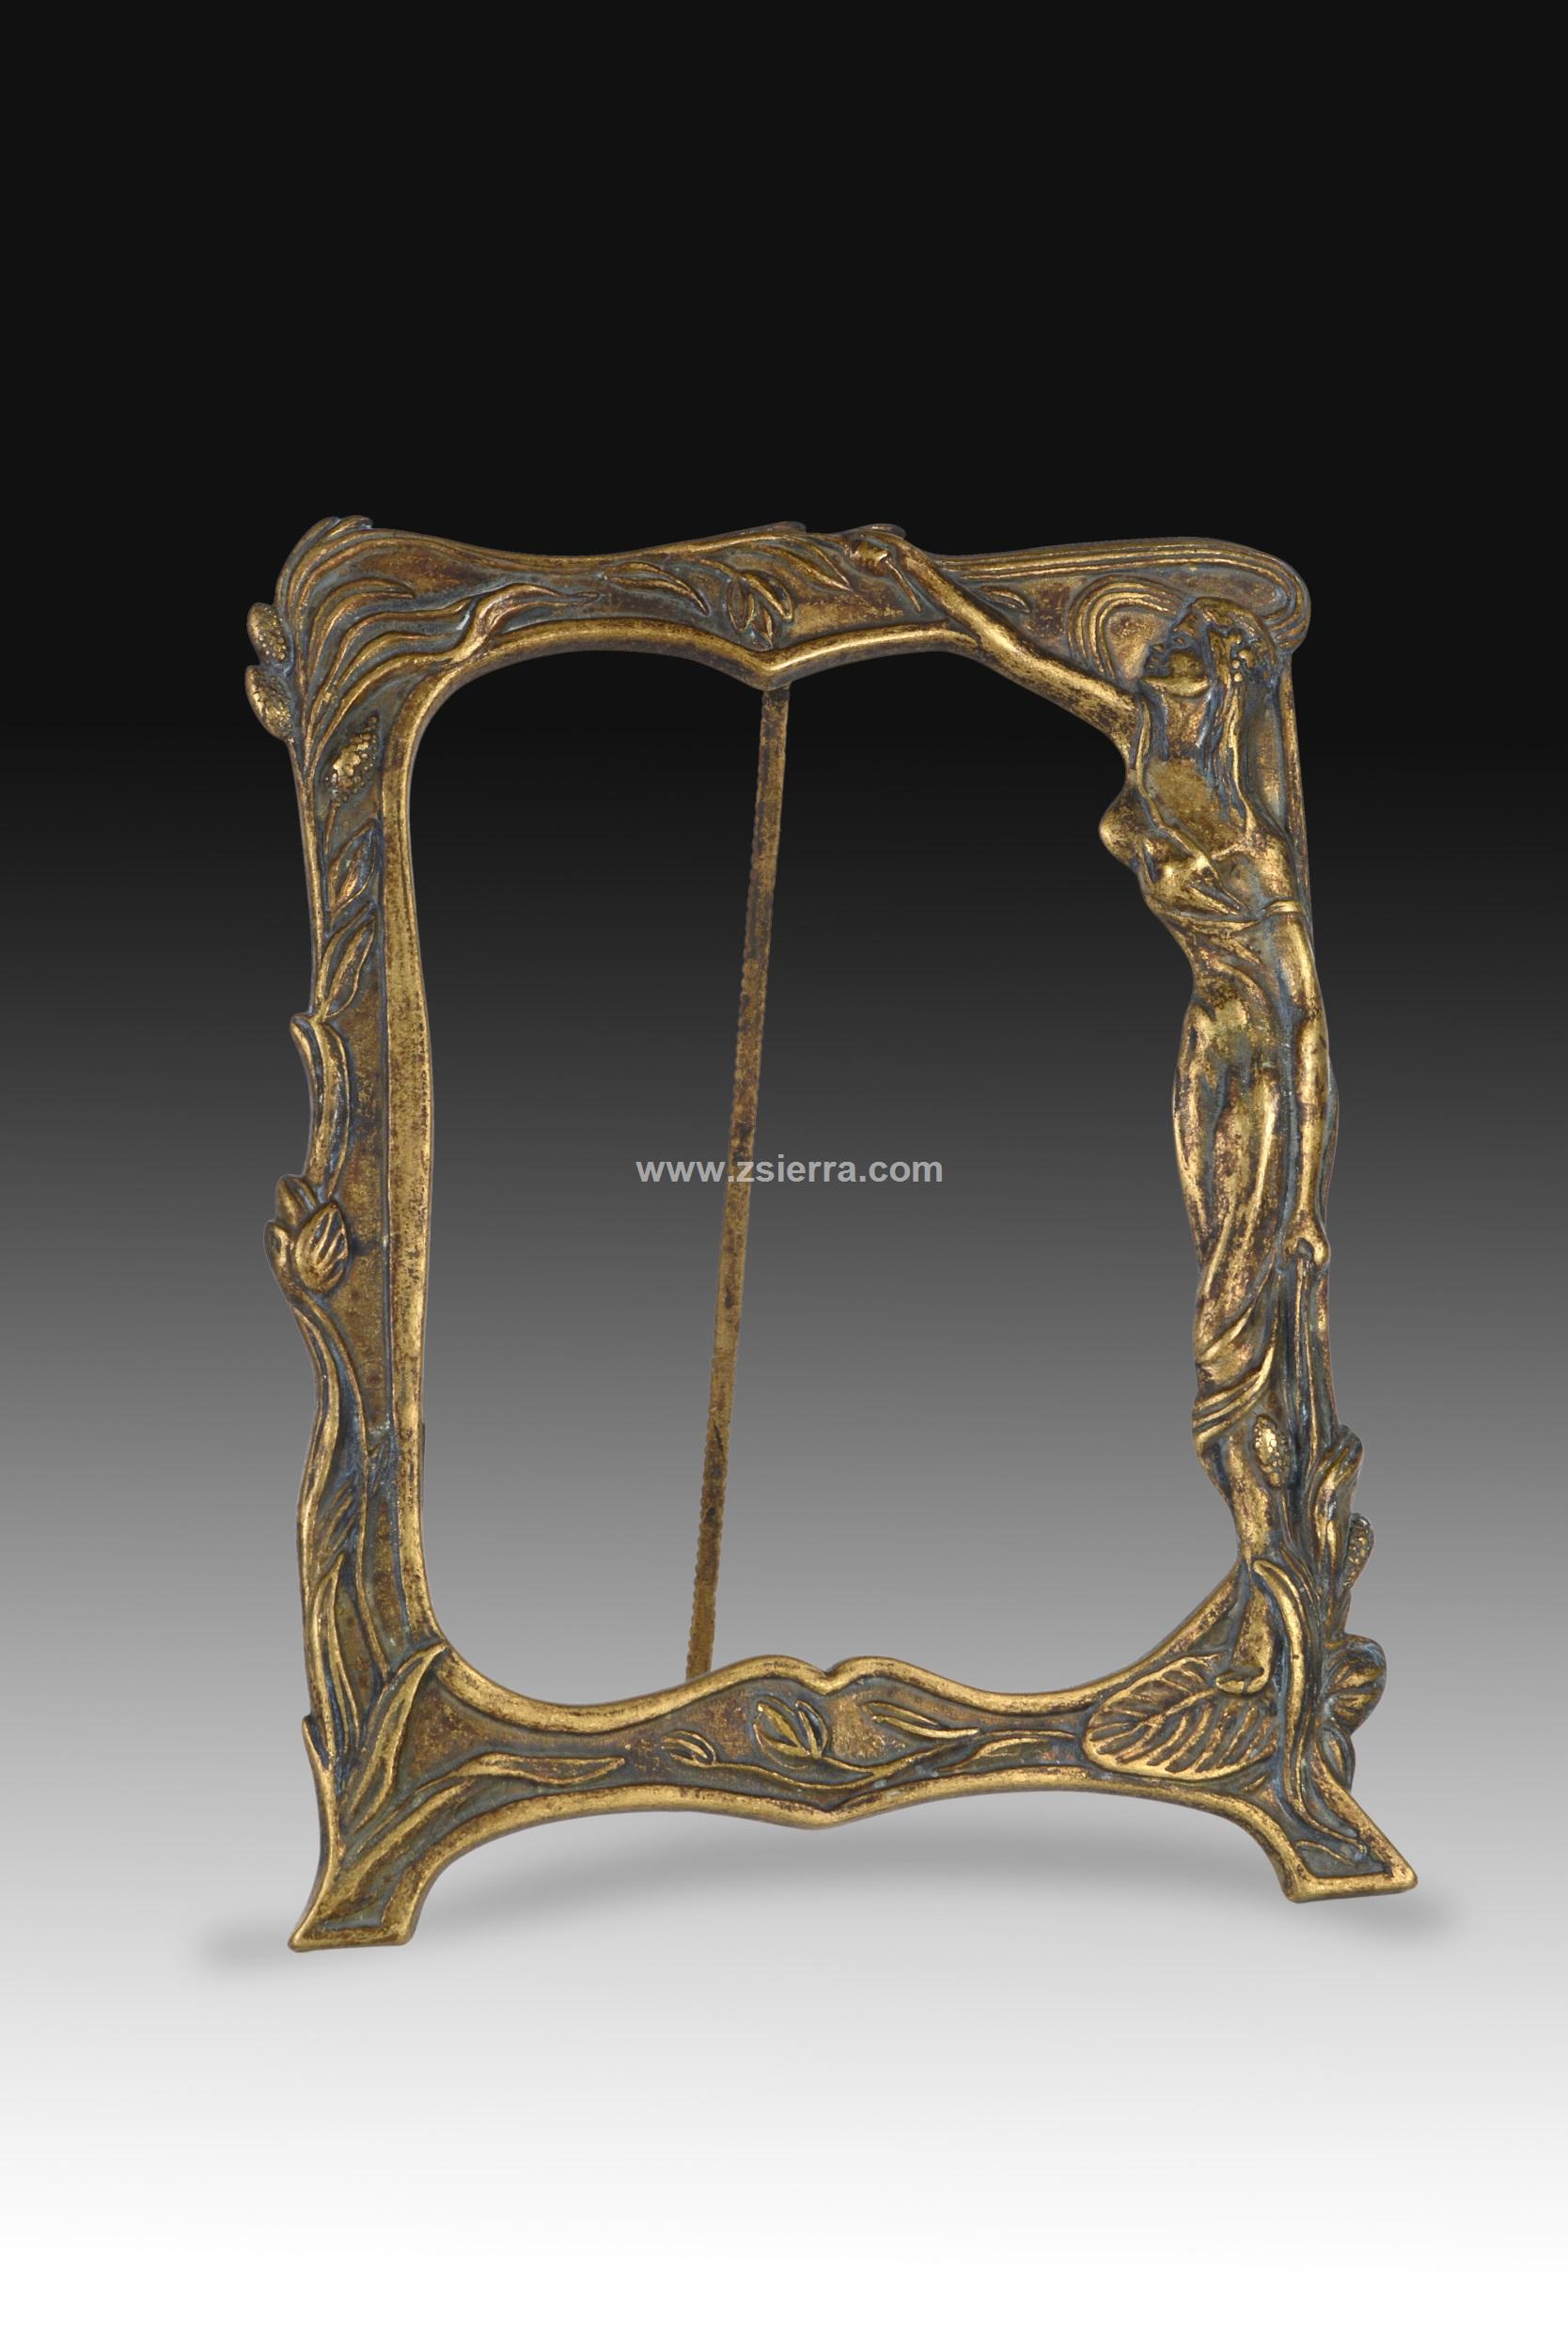 Z sierra antig edades y objetos de decoraci n marco for Decoracion art nouveau